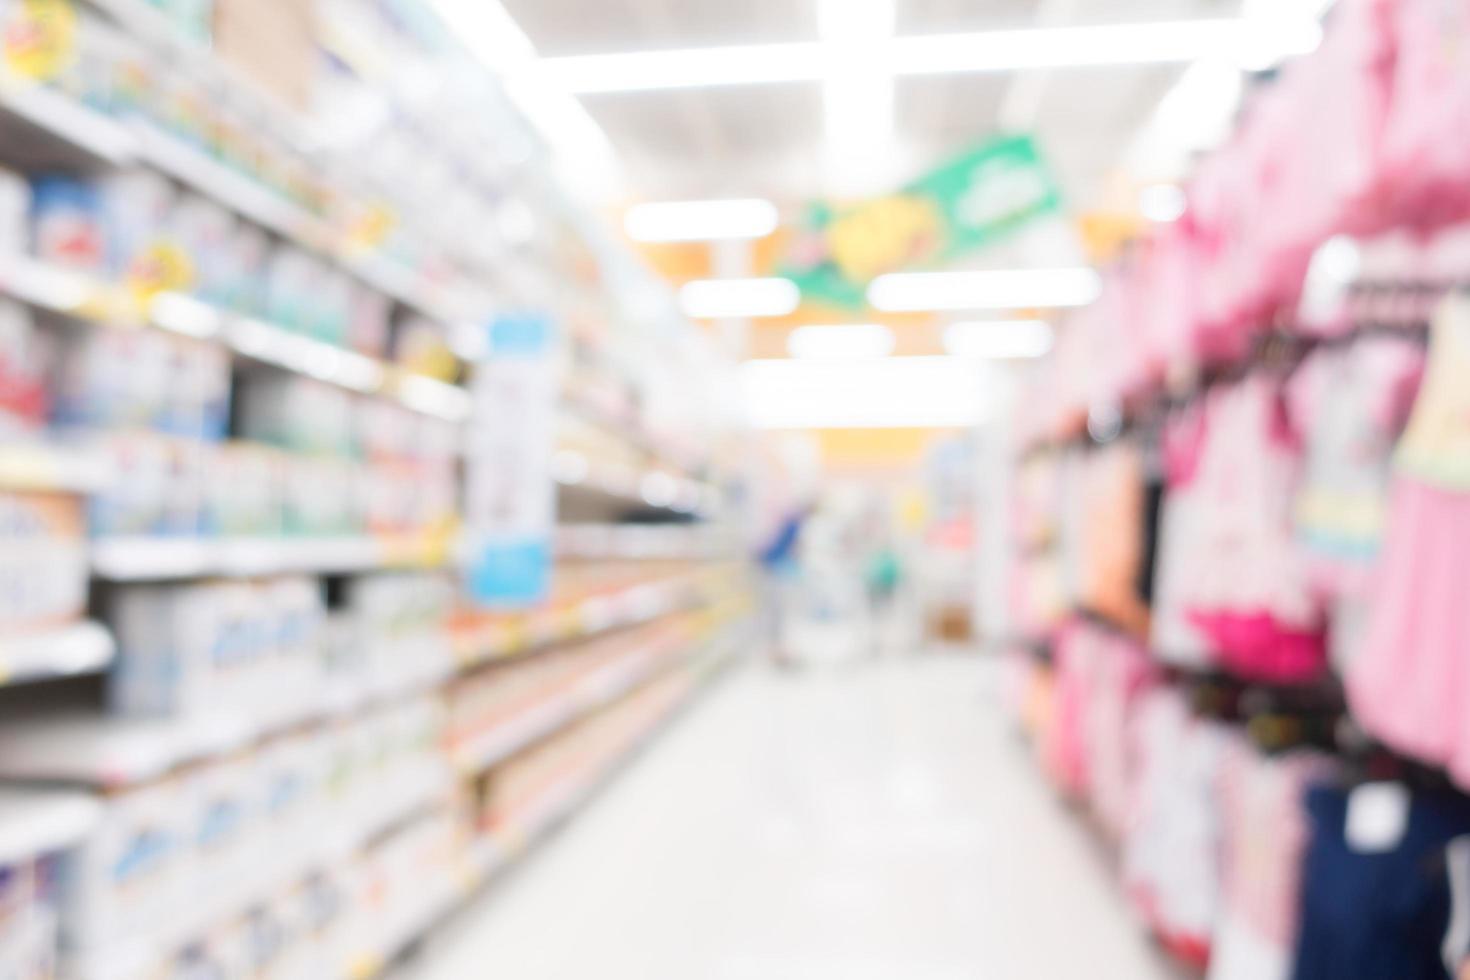 abstract intreepupil supermarkt interieur voor achtergrond foto